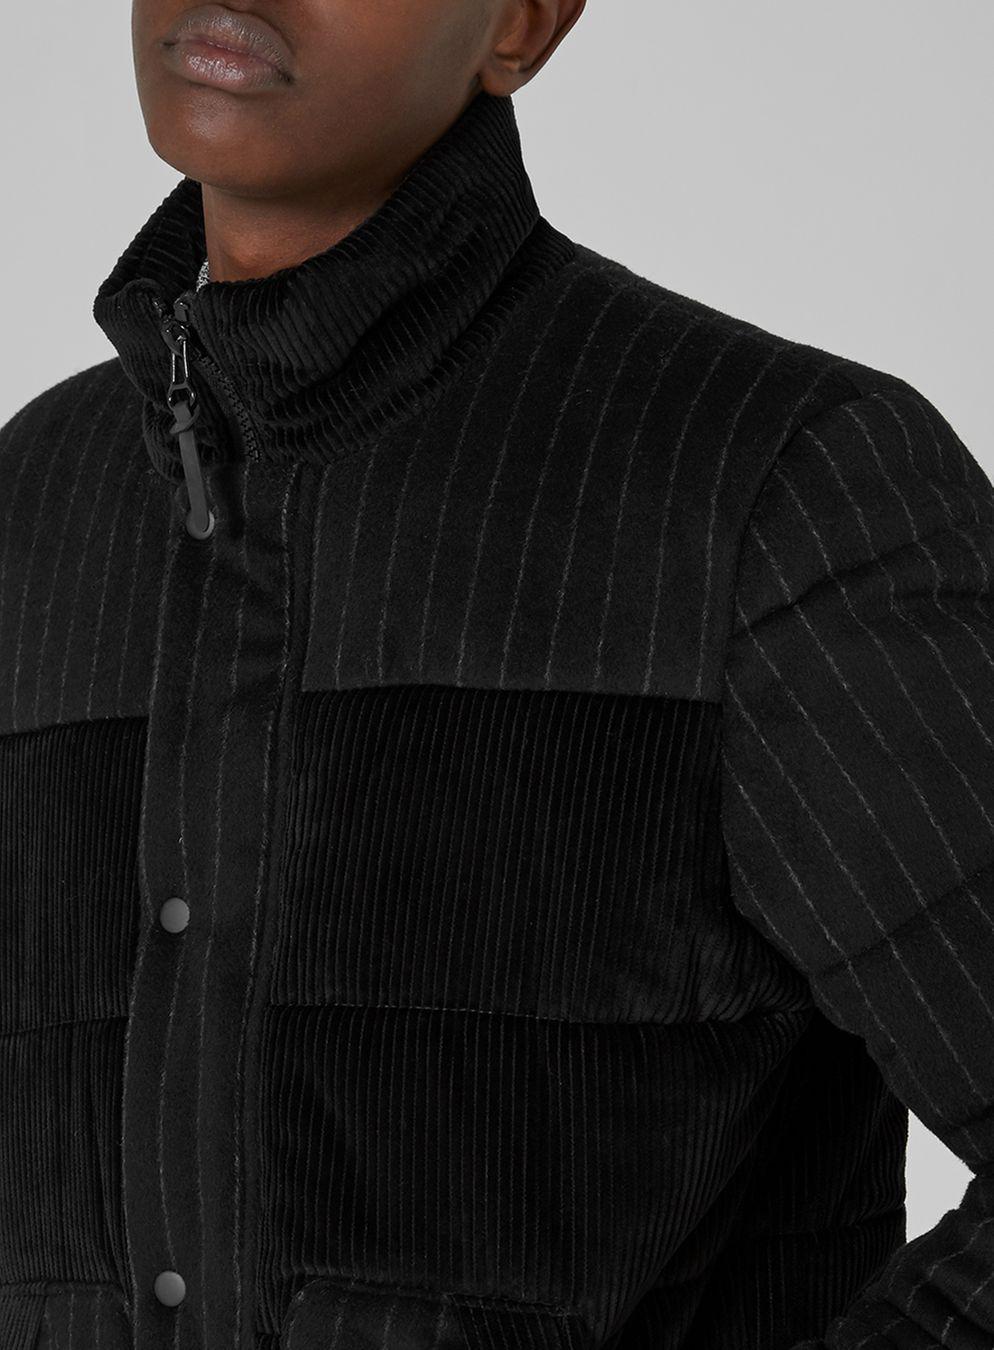 TOPMAN Black Corduroy Puffer Jacket for Men - Lyst